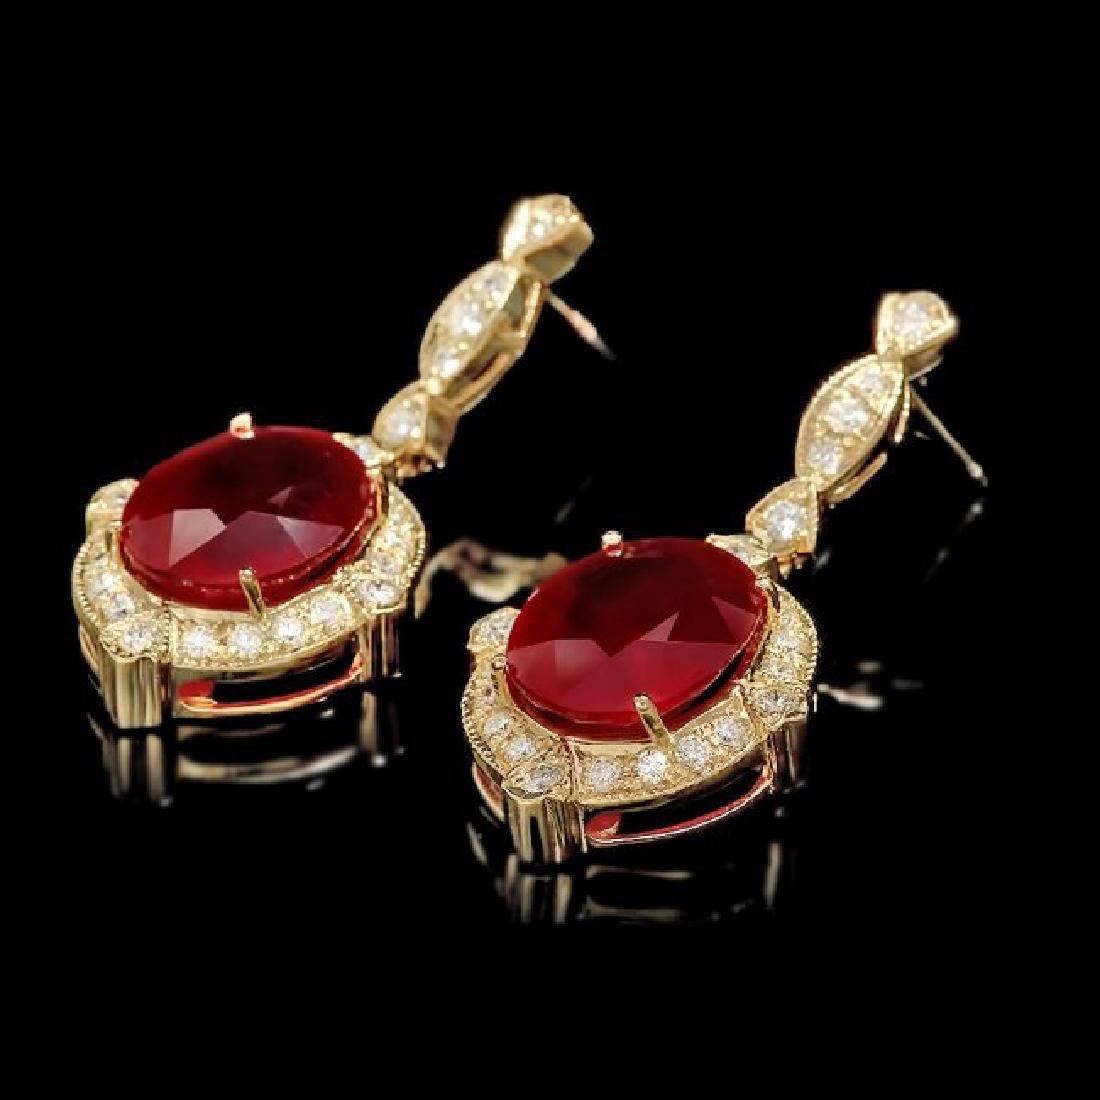 14k Gold 22.50ct Ruby 1.70ct Diamond Earrings - 3